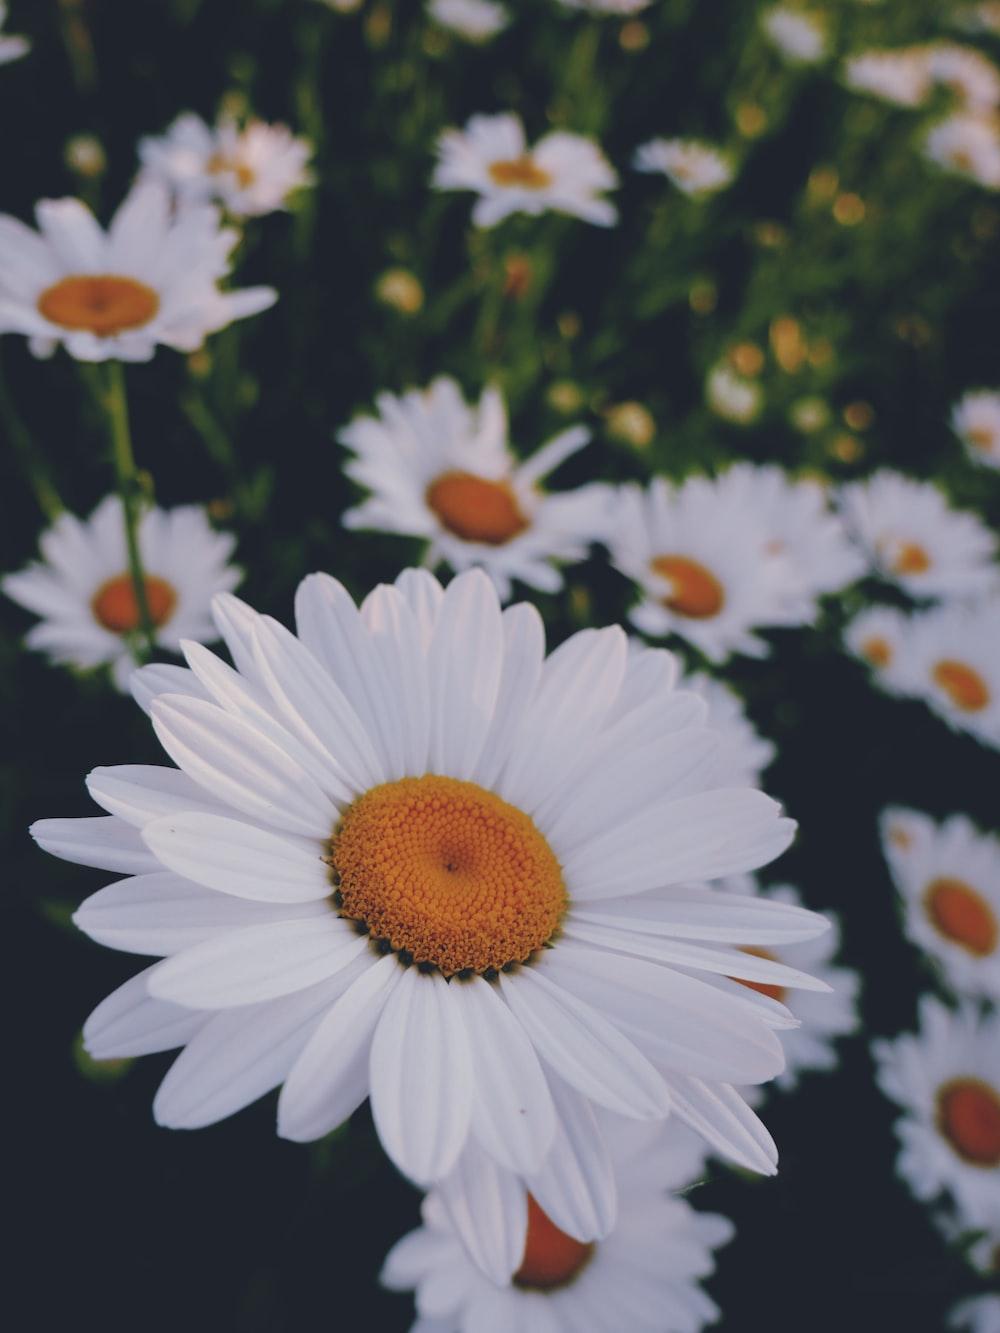 white daisy flower in bloom during daytime